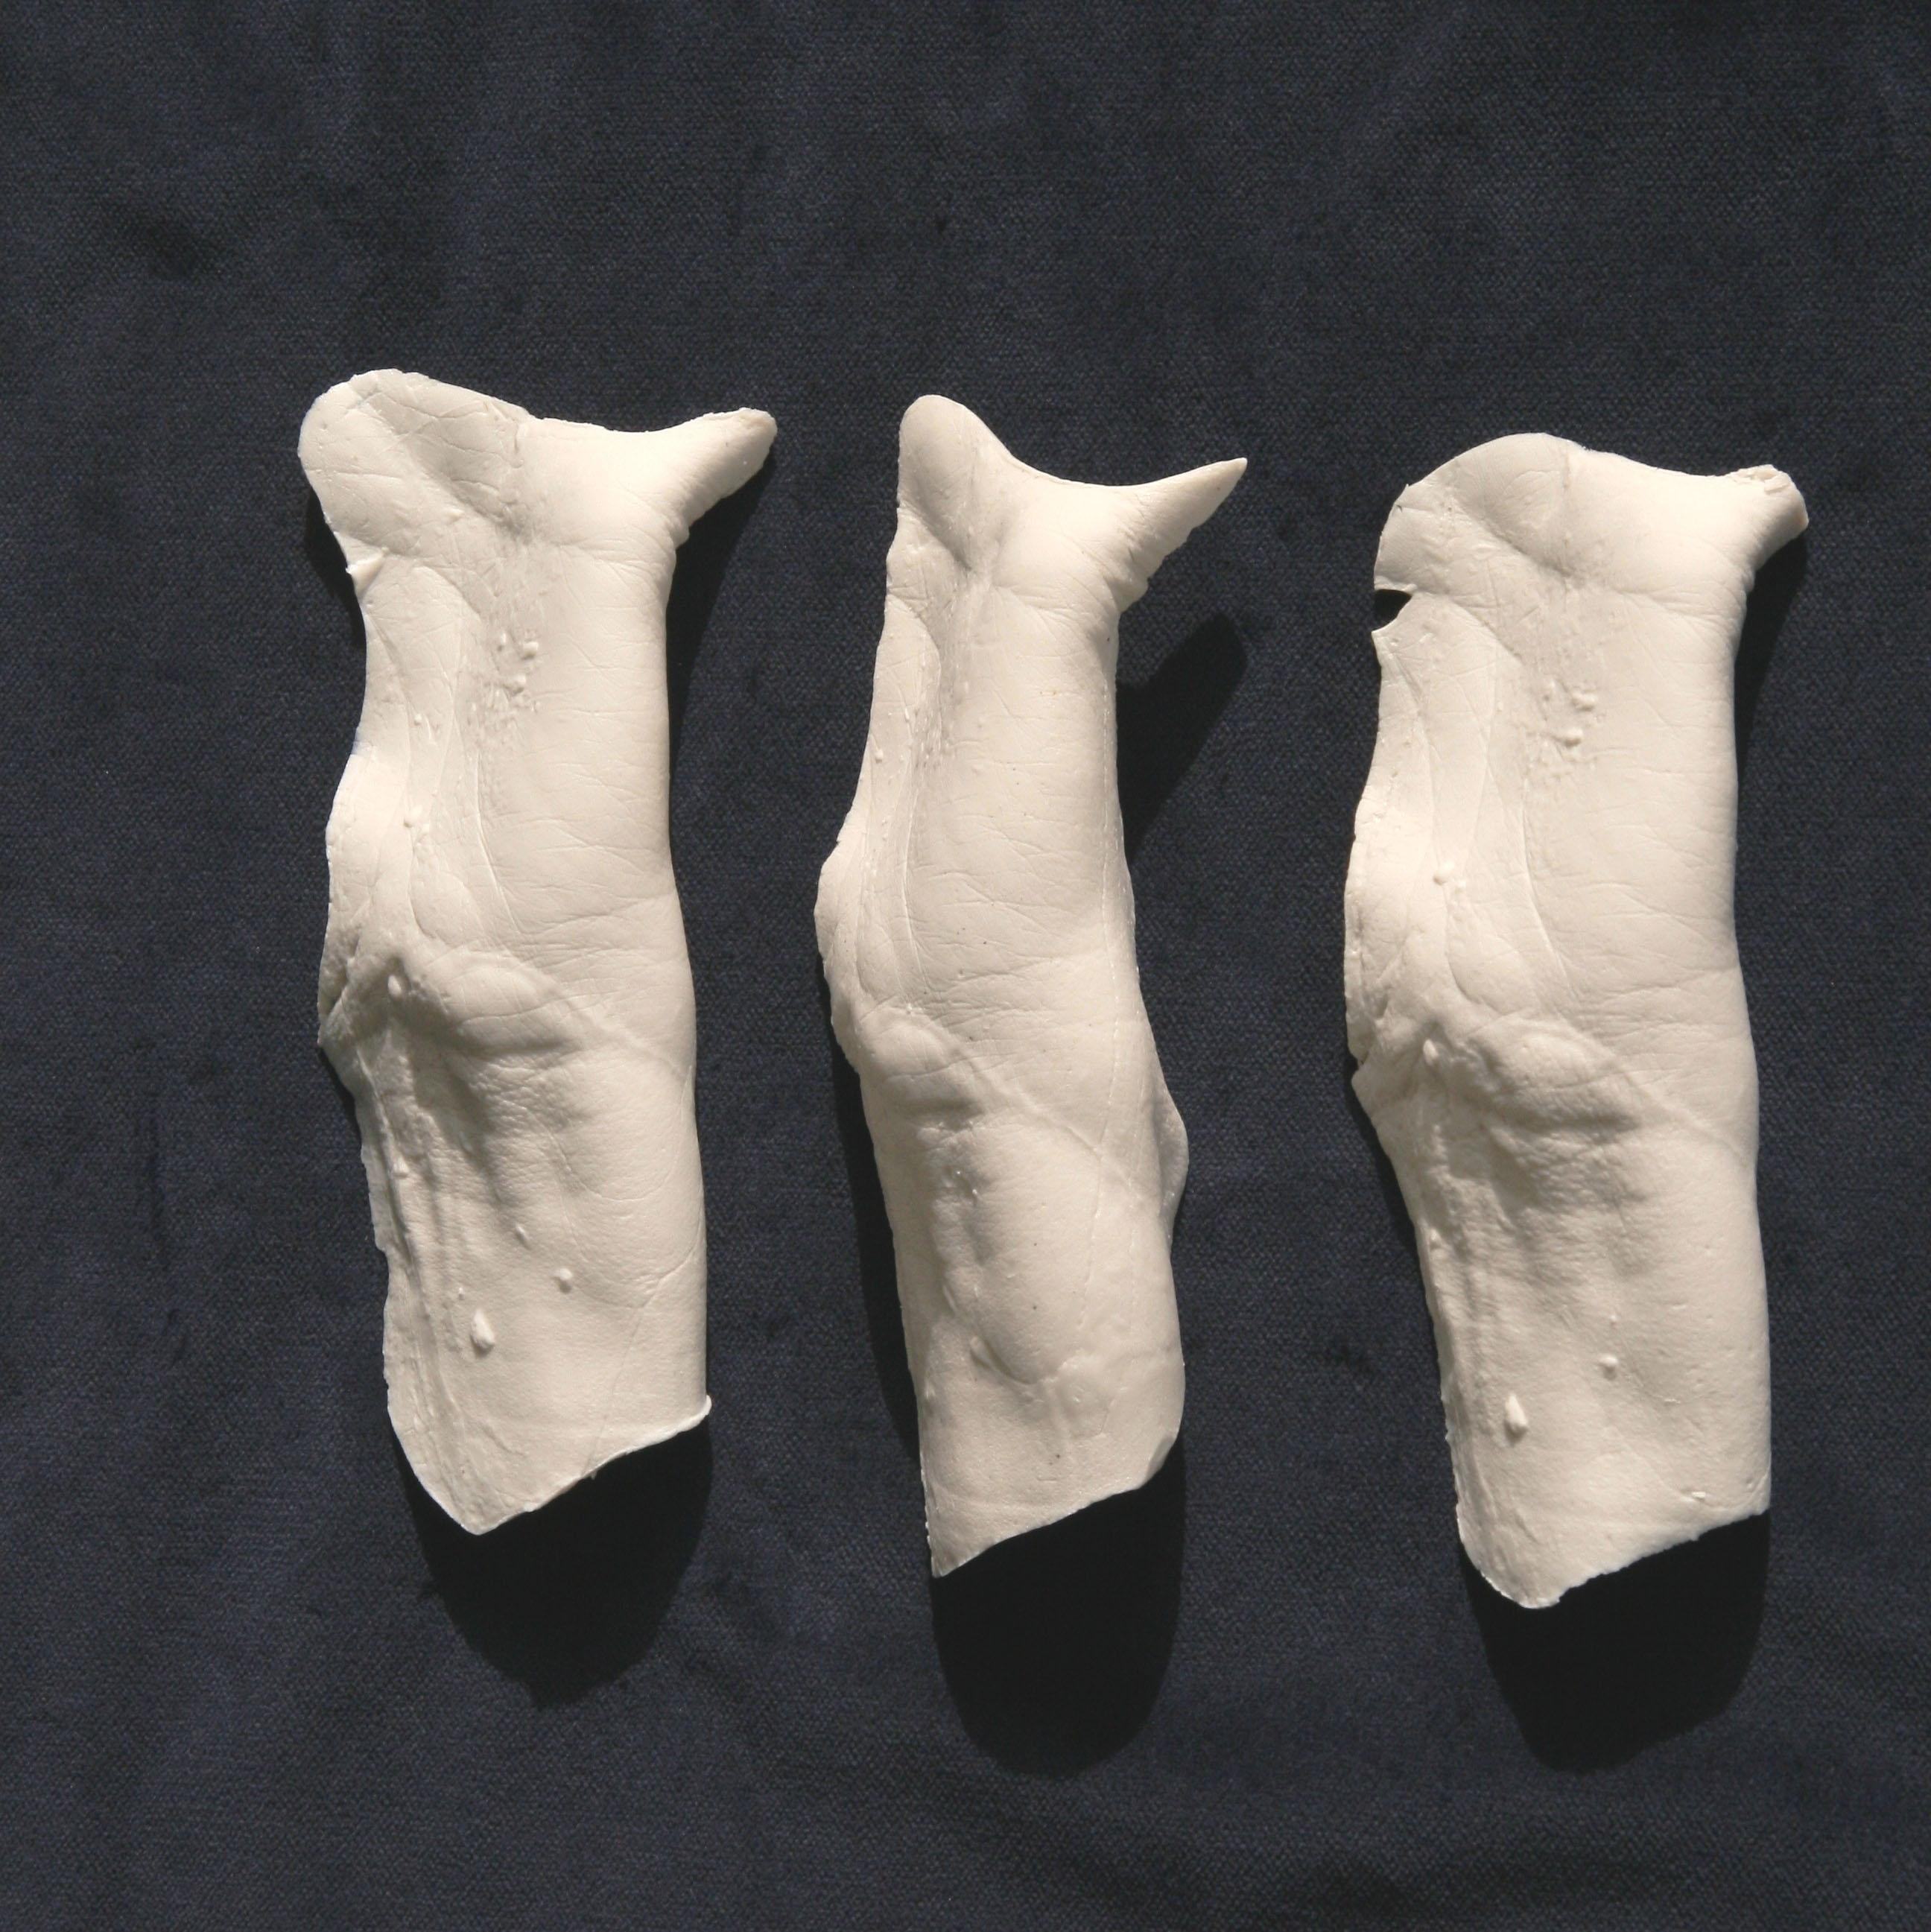 Life Scars I porcelain slip sq1 copy